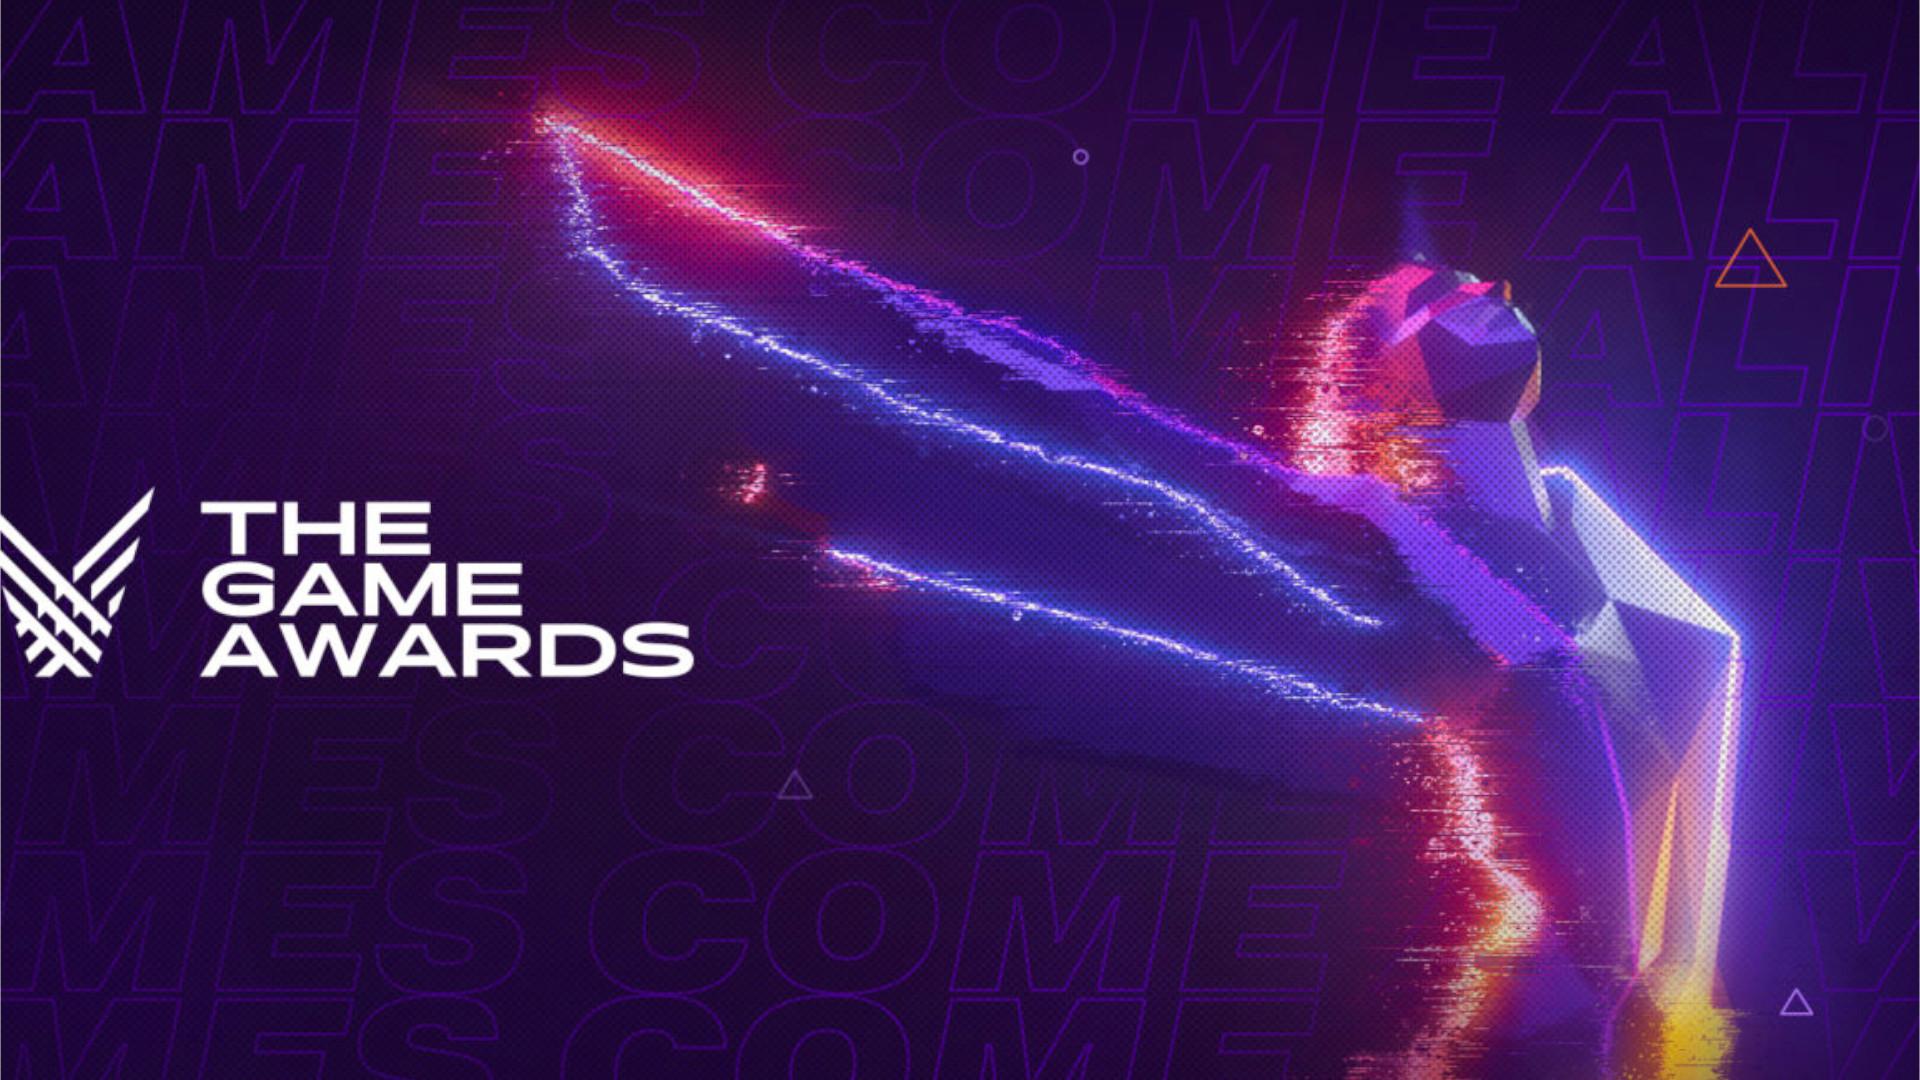 The Game Awards 2019 Spezial - Audio Log GamesCast #S01